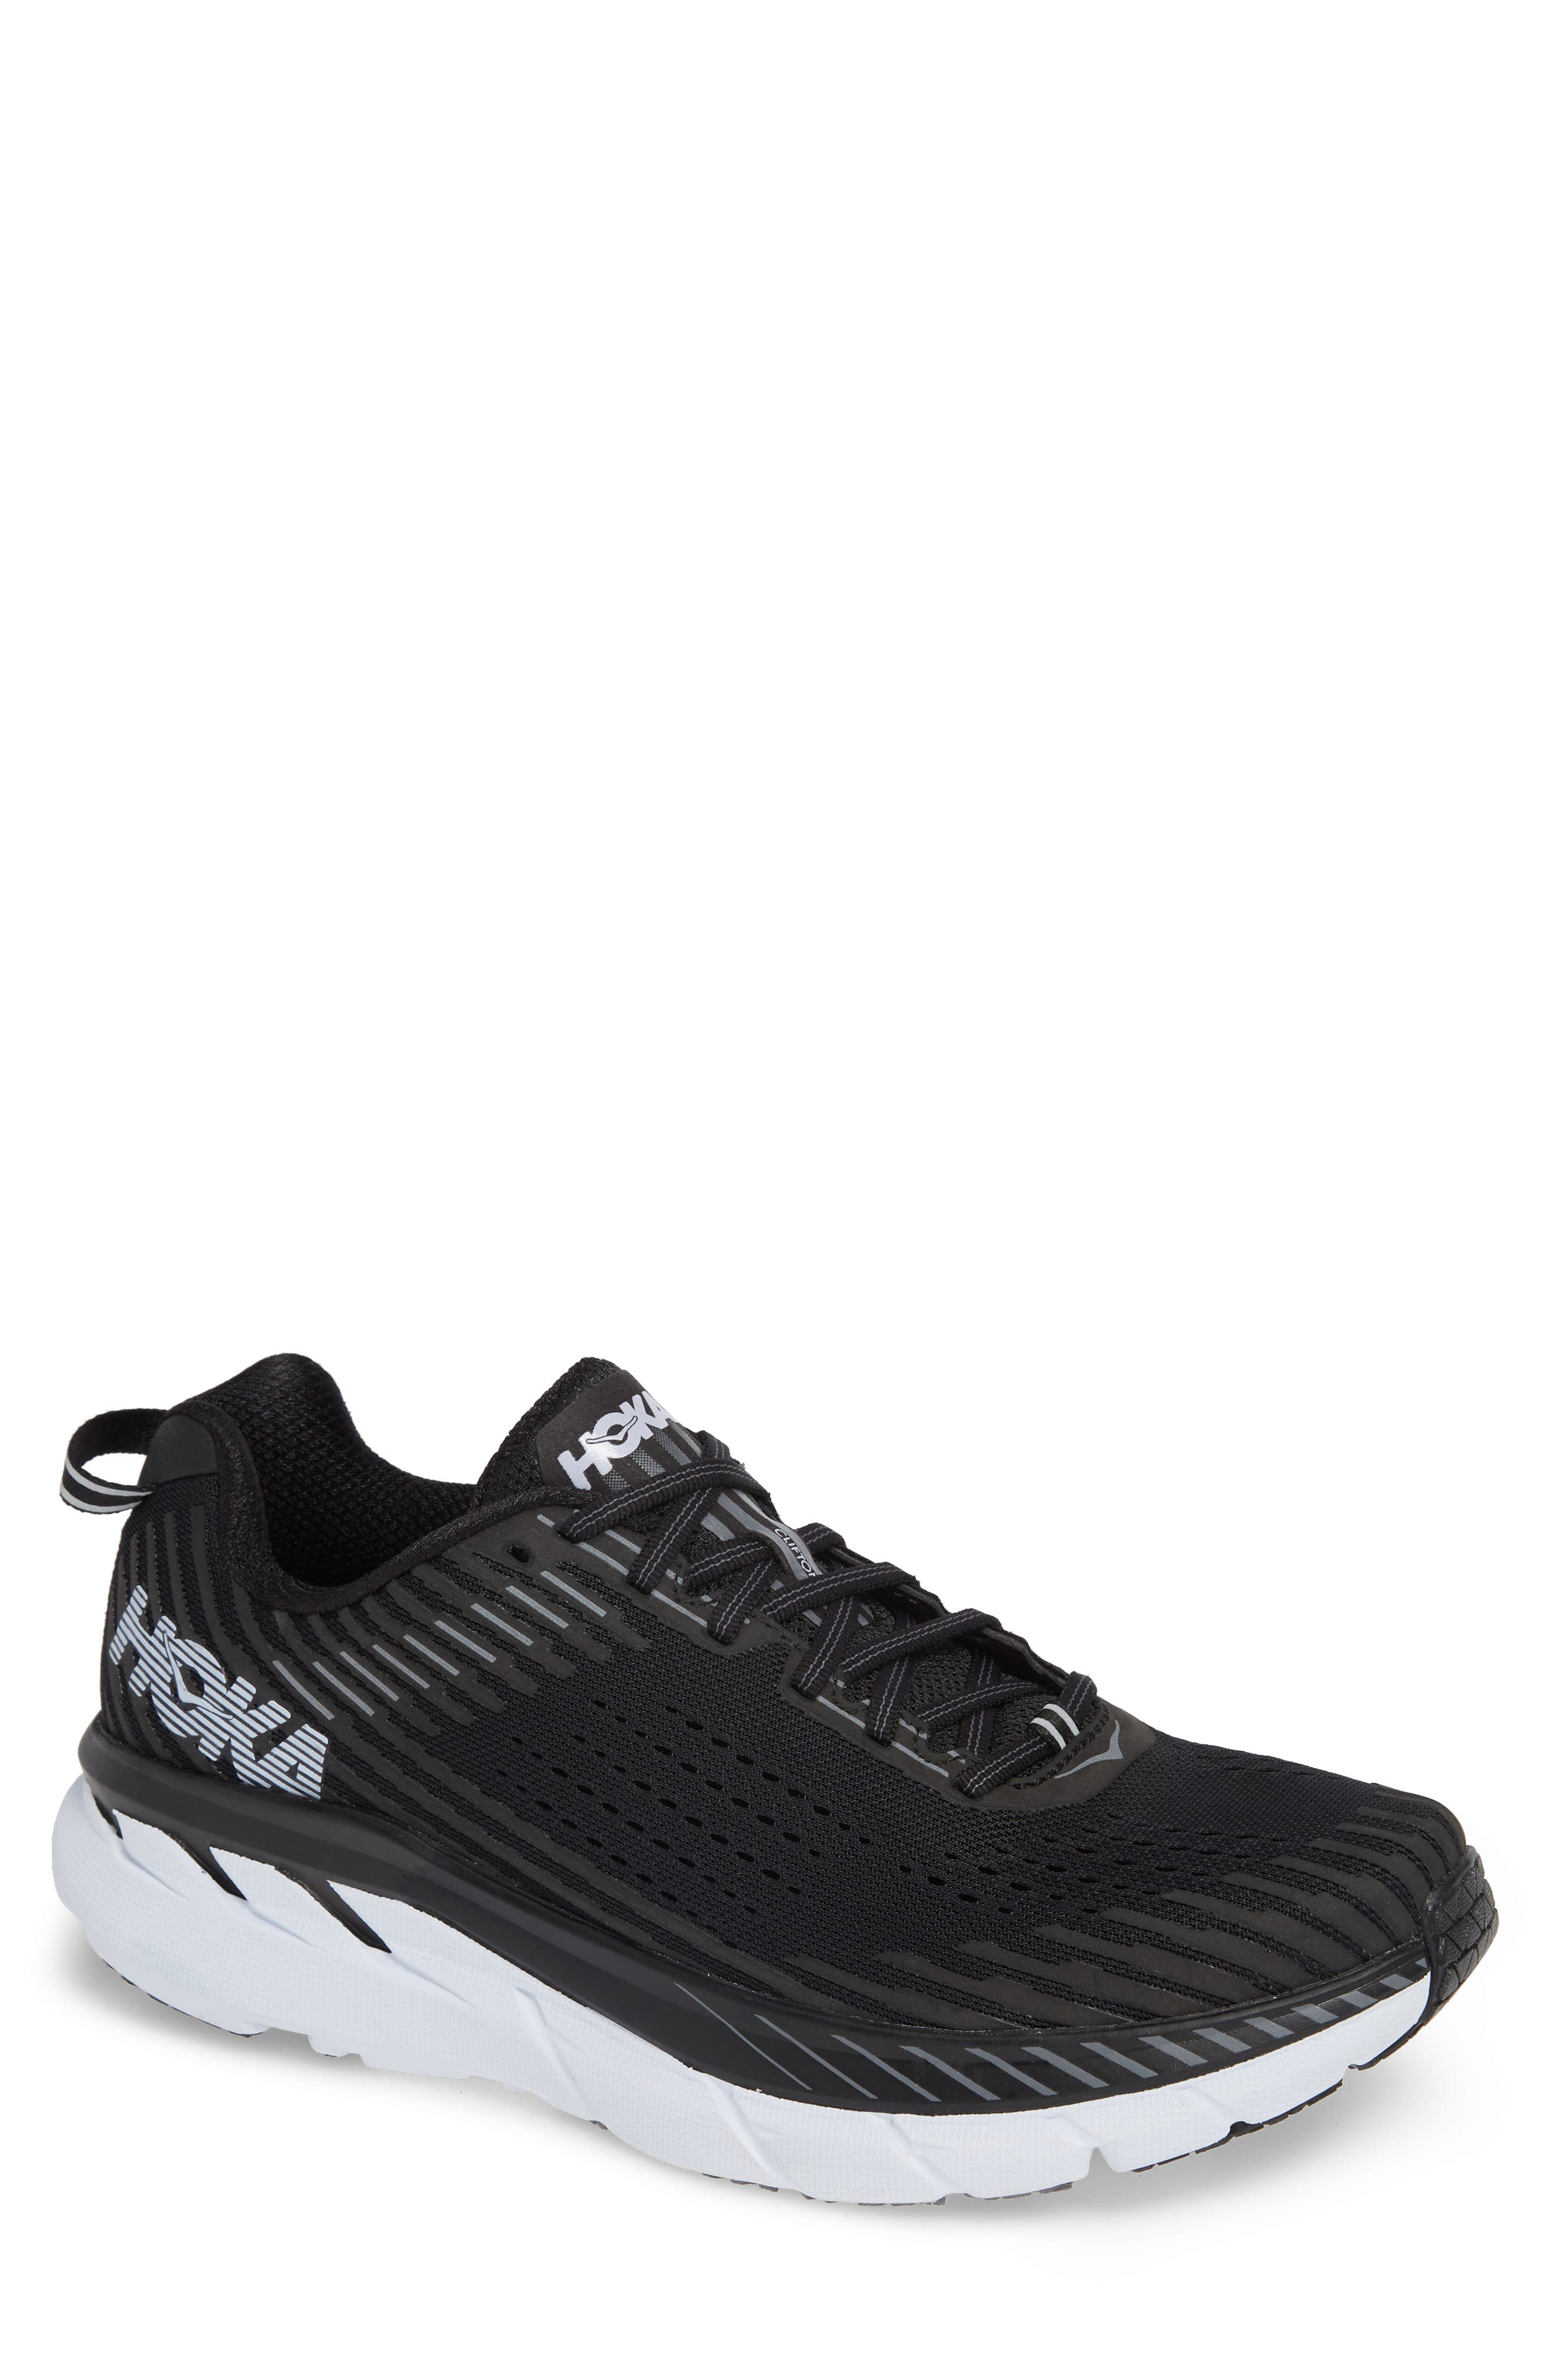 Clifton 5 Running Shoe,                         Main,                         color, BLACK/ WHITE